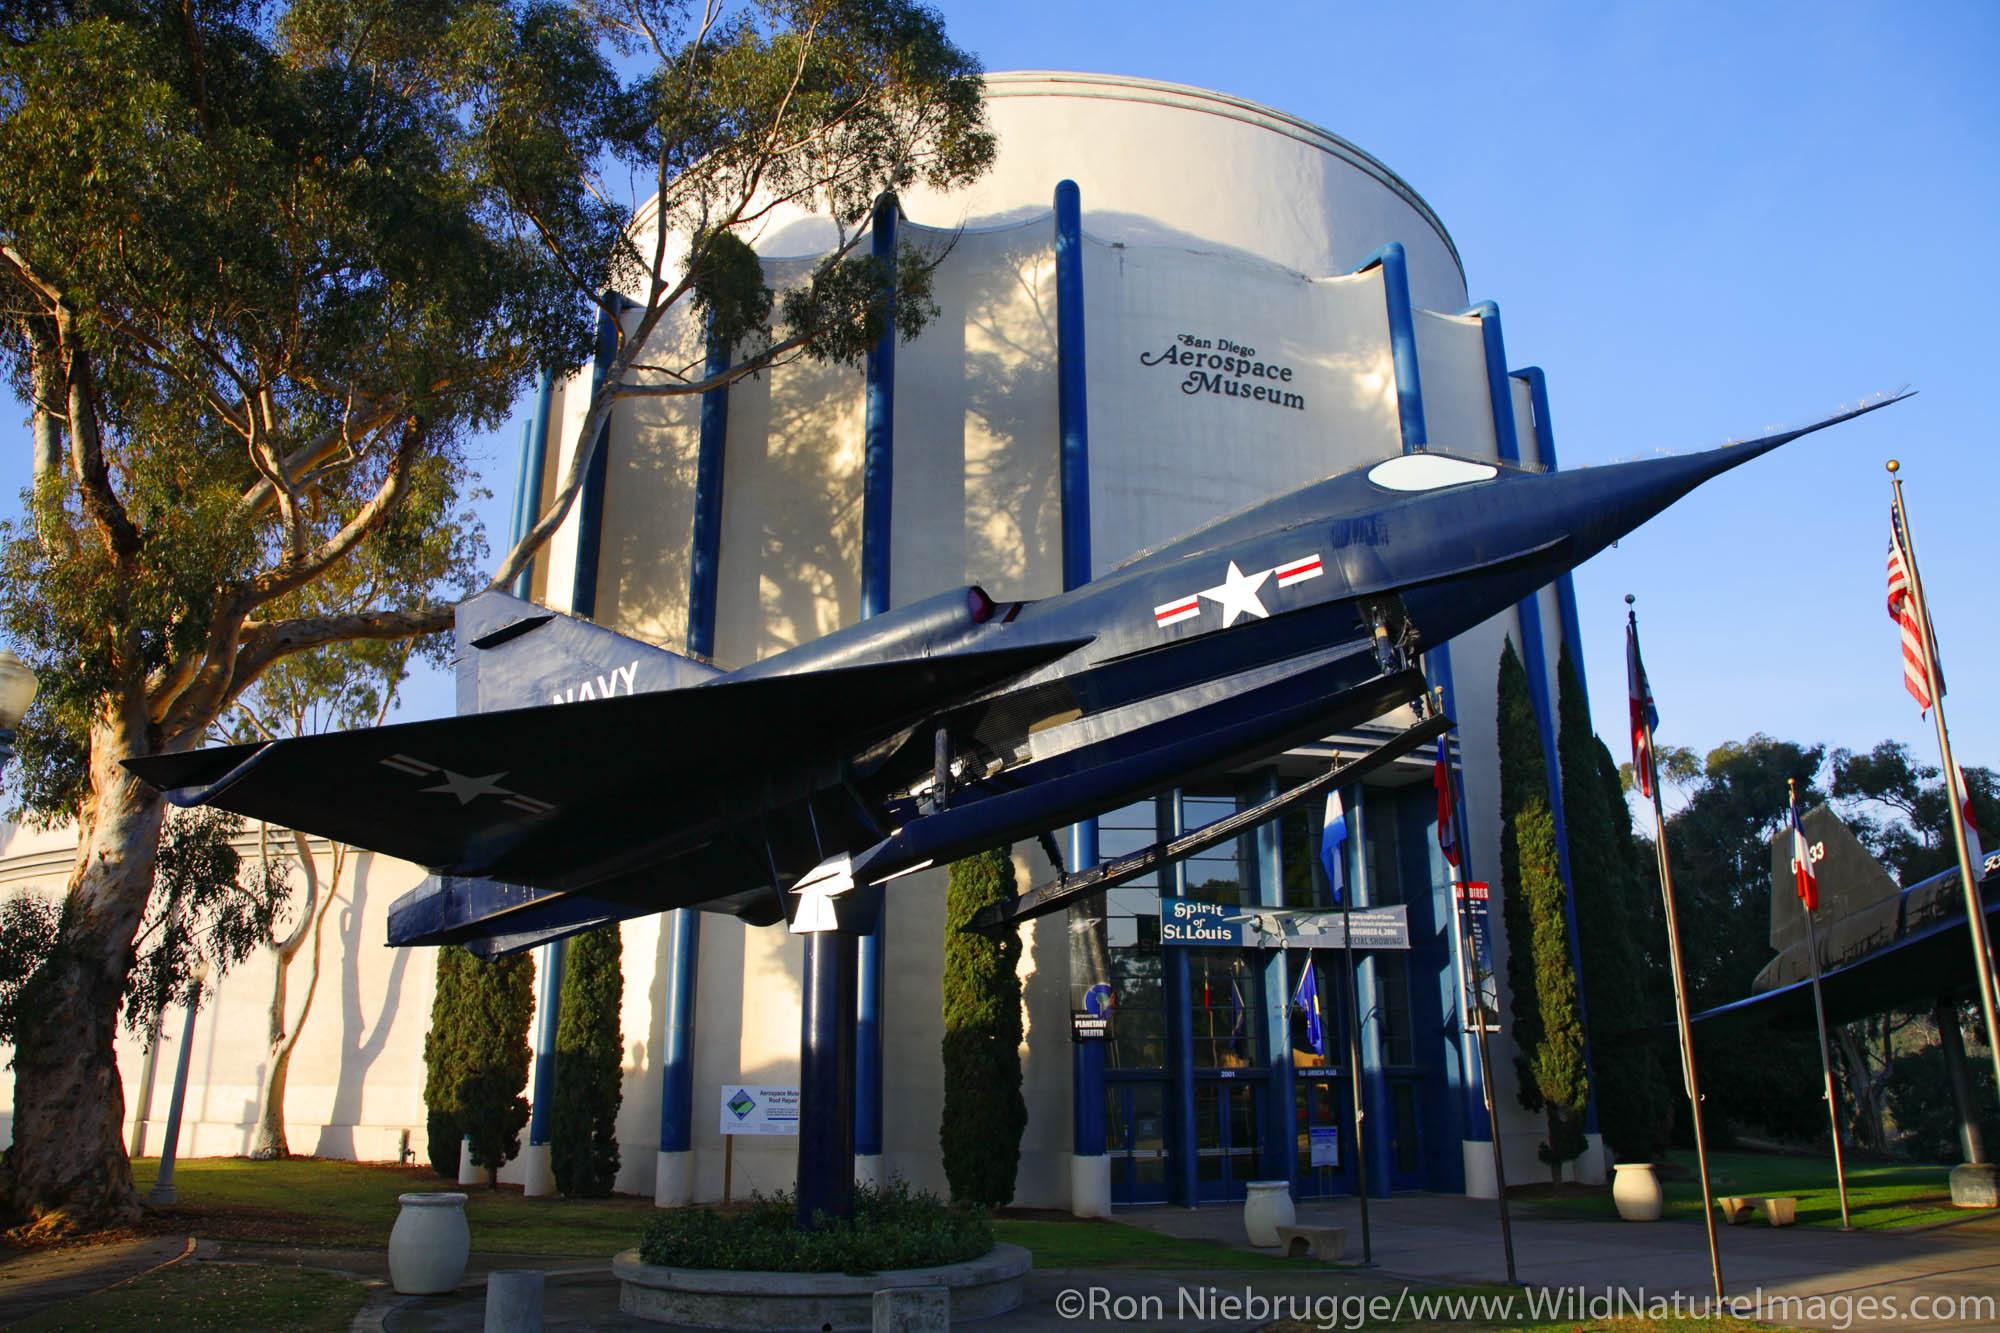 San Diego Aerospace Museum, Balboa Park, San Diego, California.